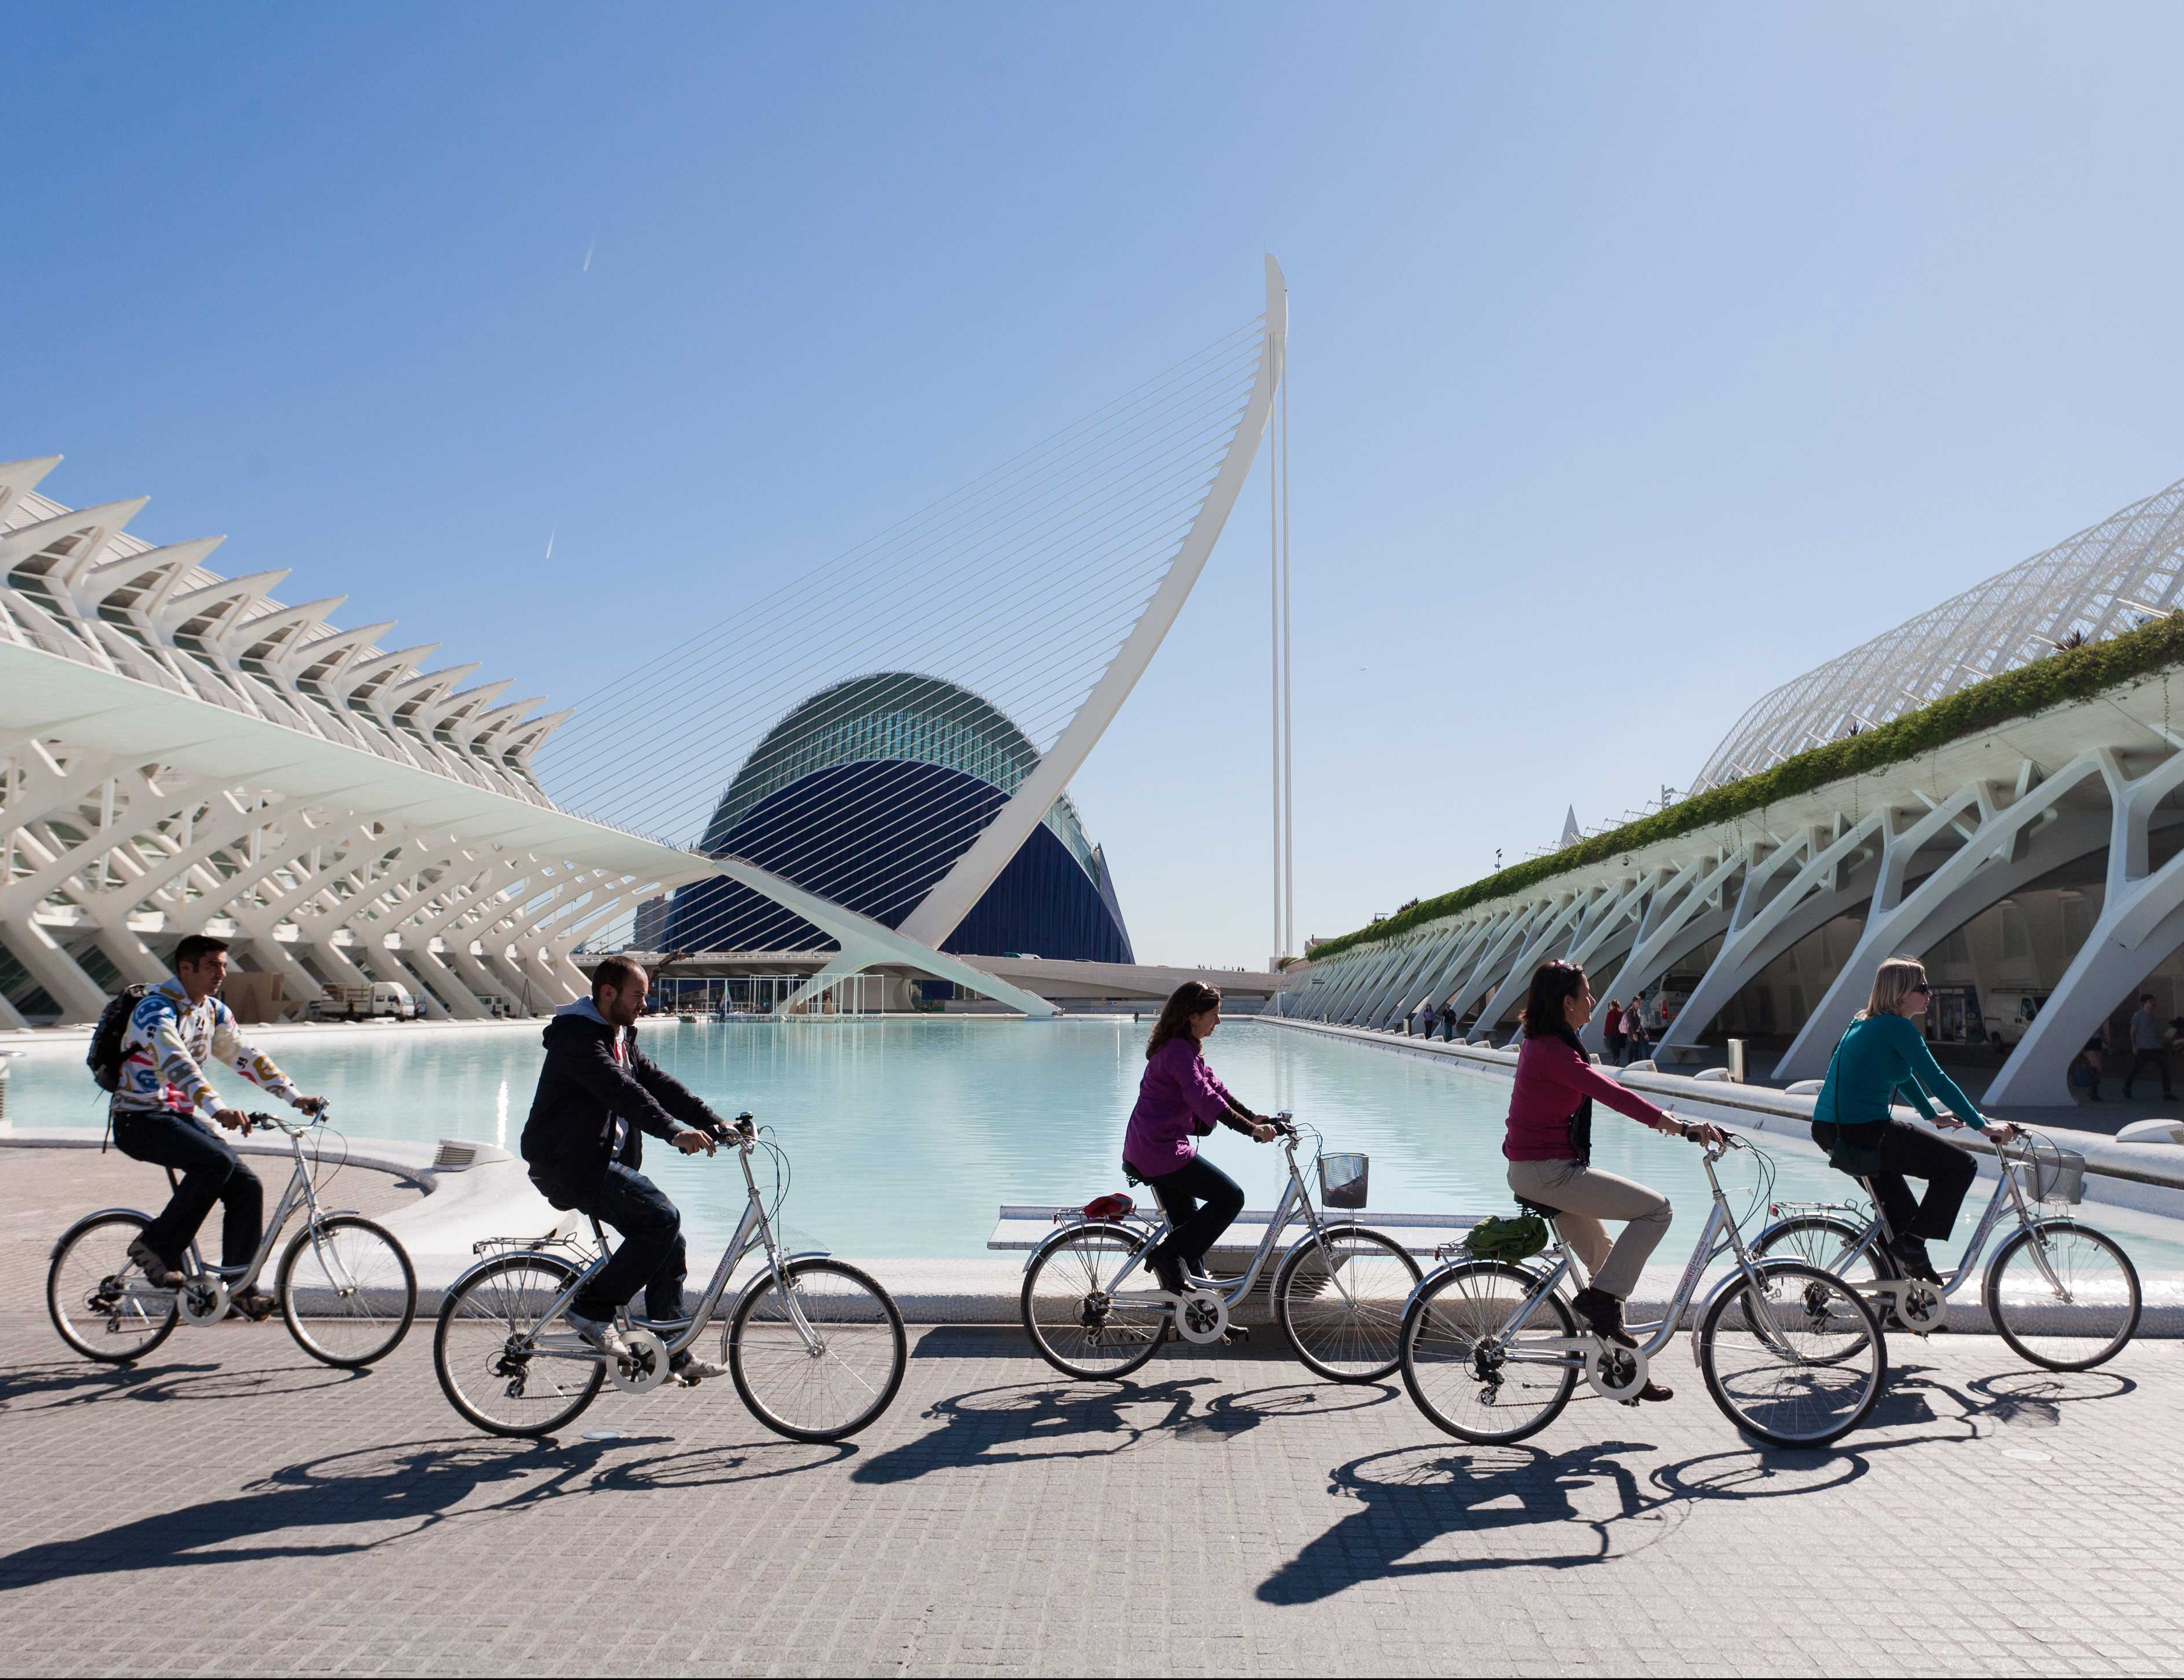 fietstour tijdens je citytrip in Valencia